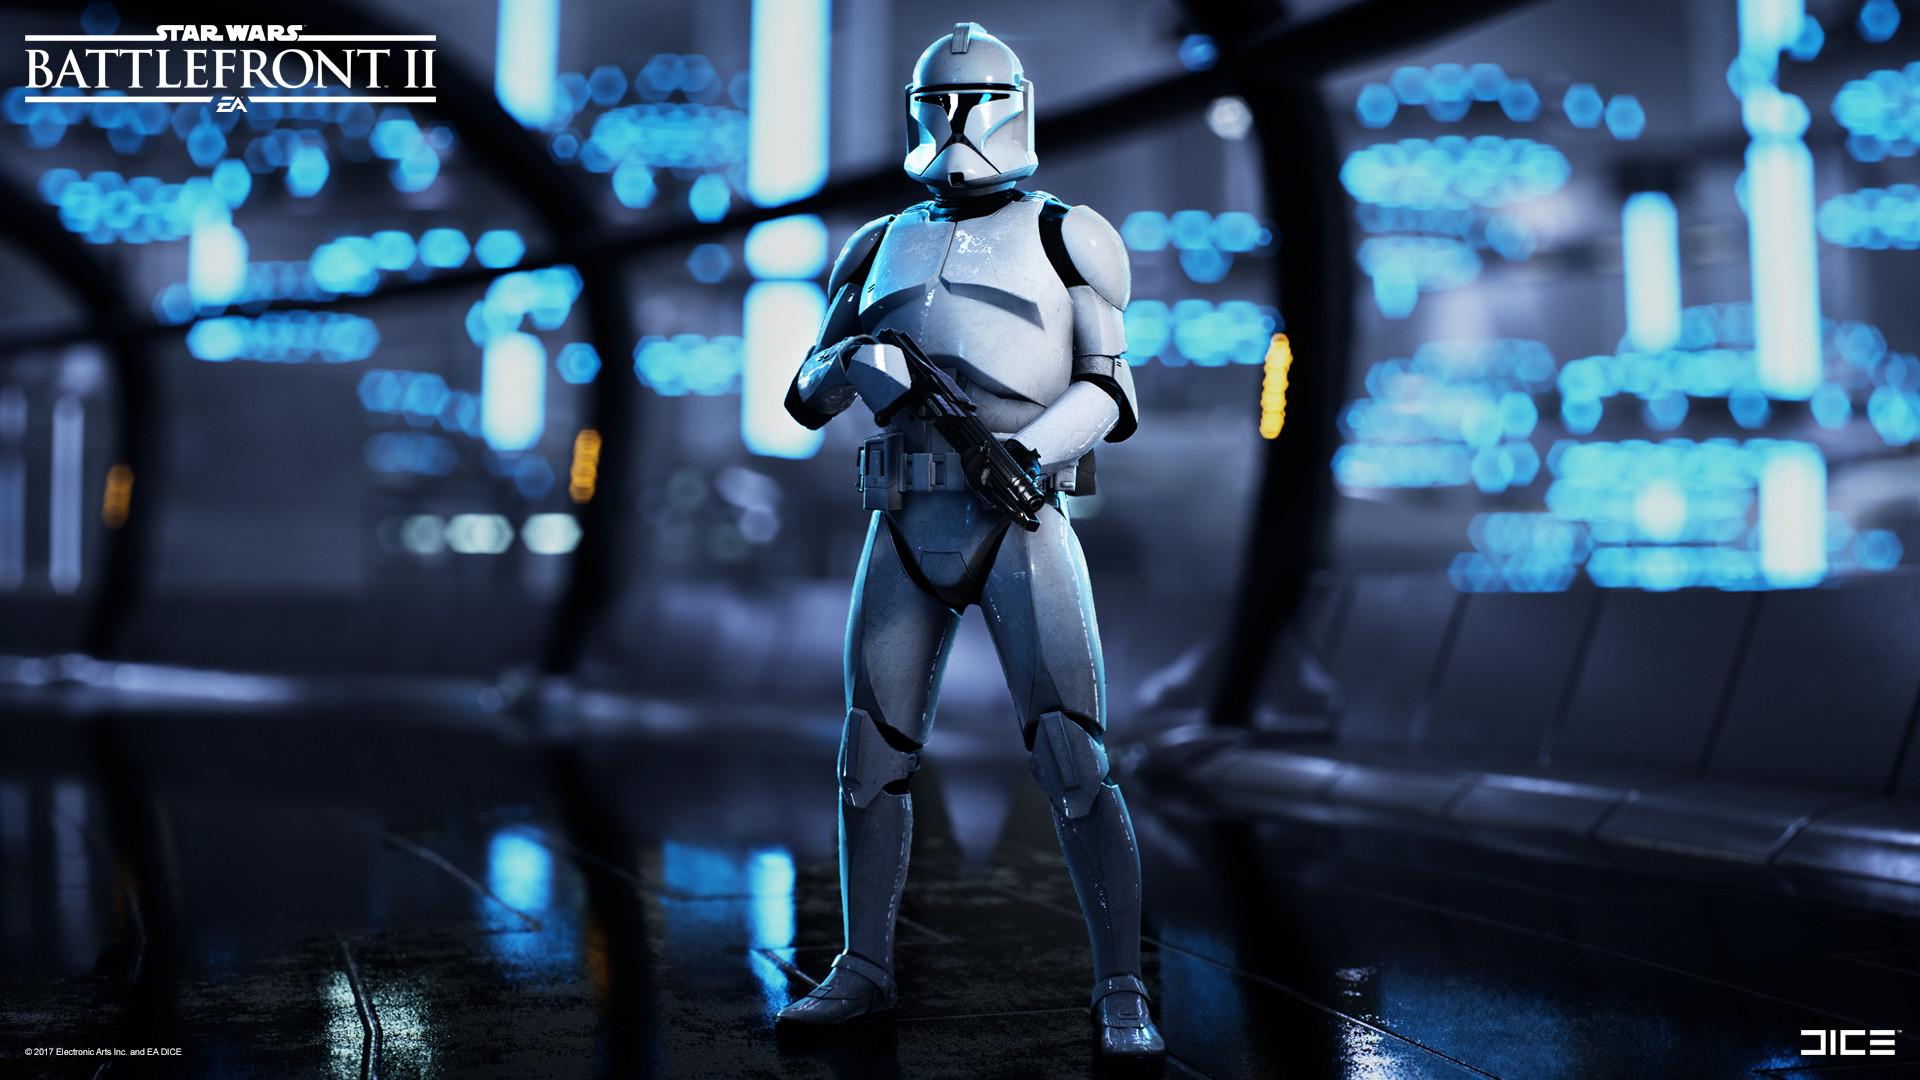 image clone trooper assault björn arvidsson 2 jpg star wars